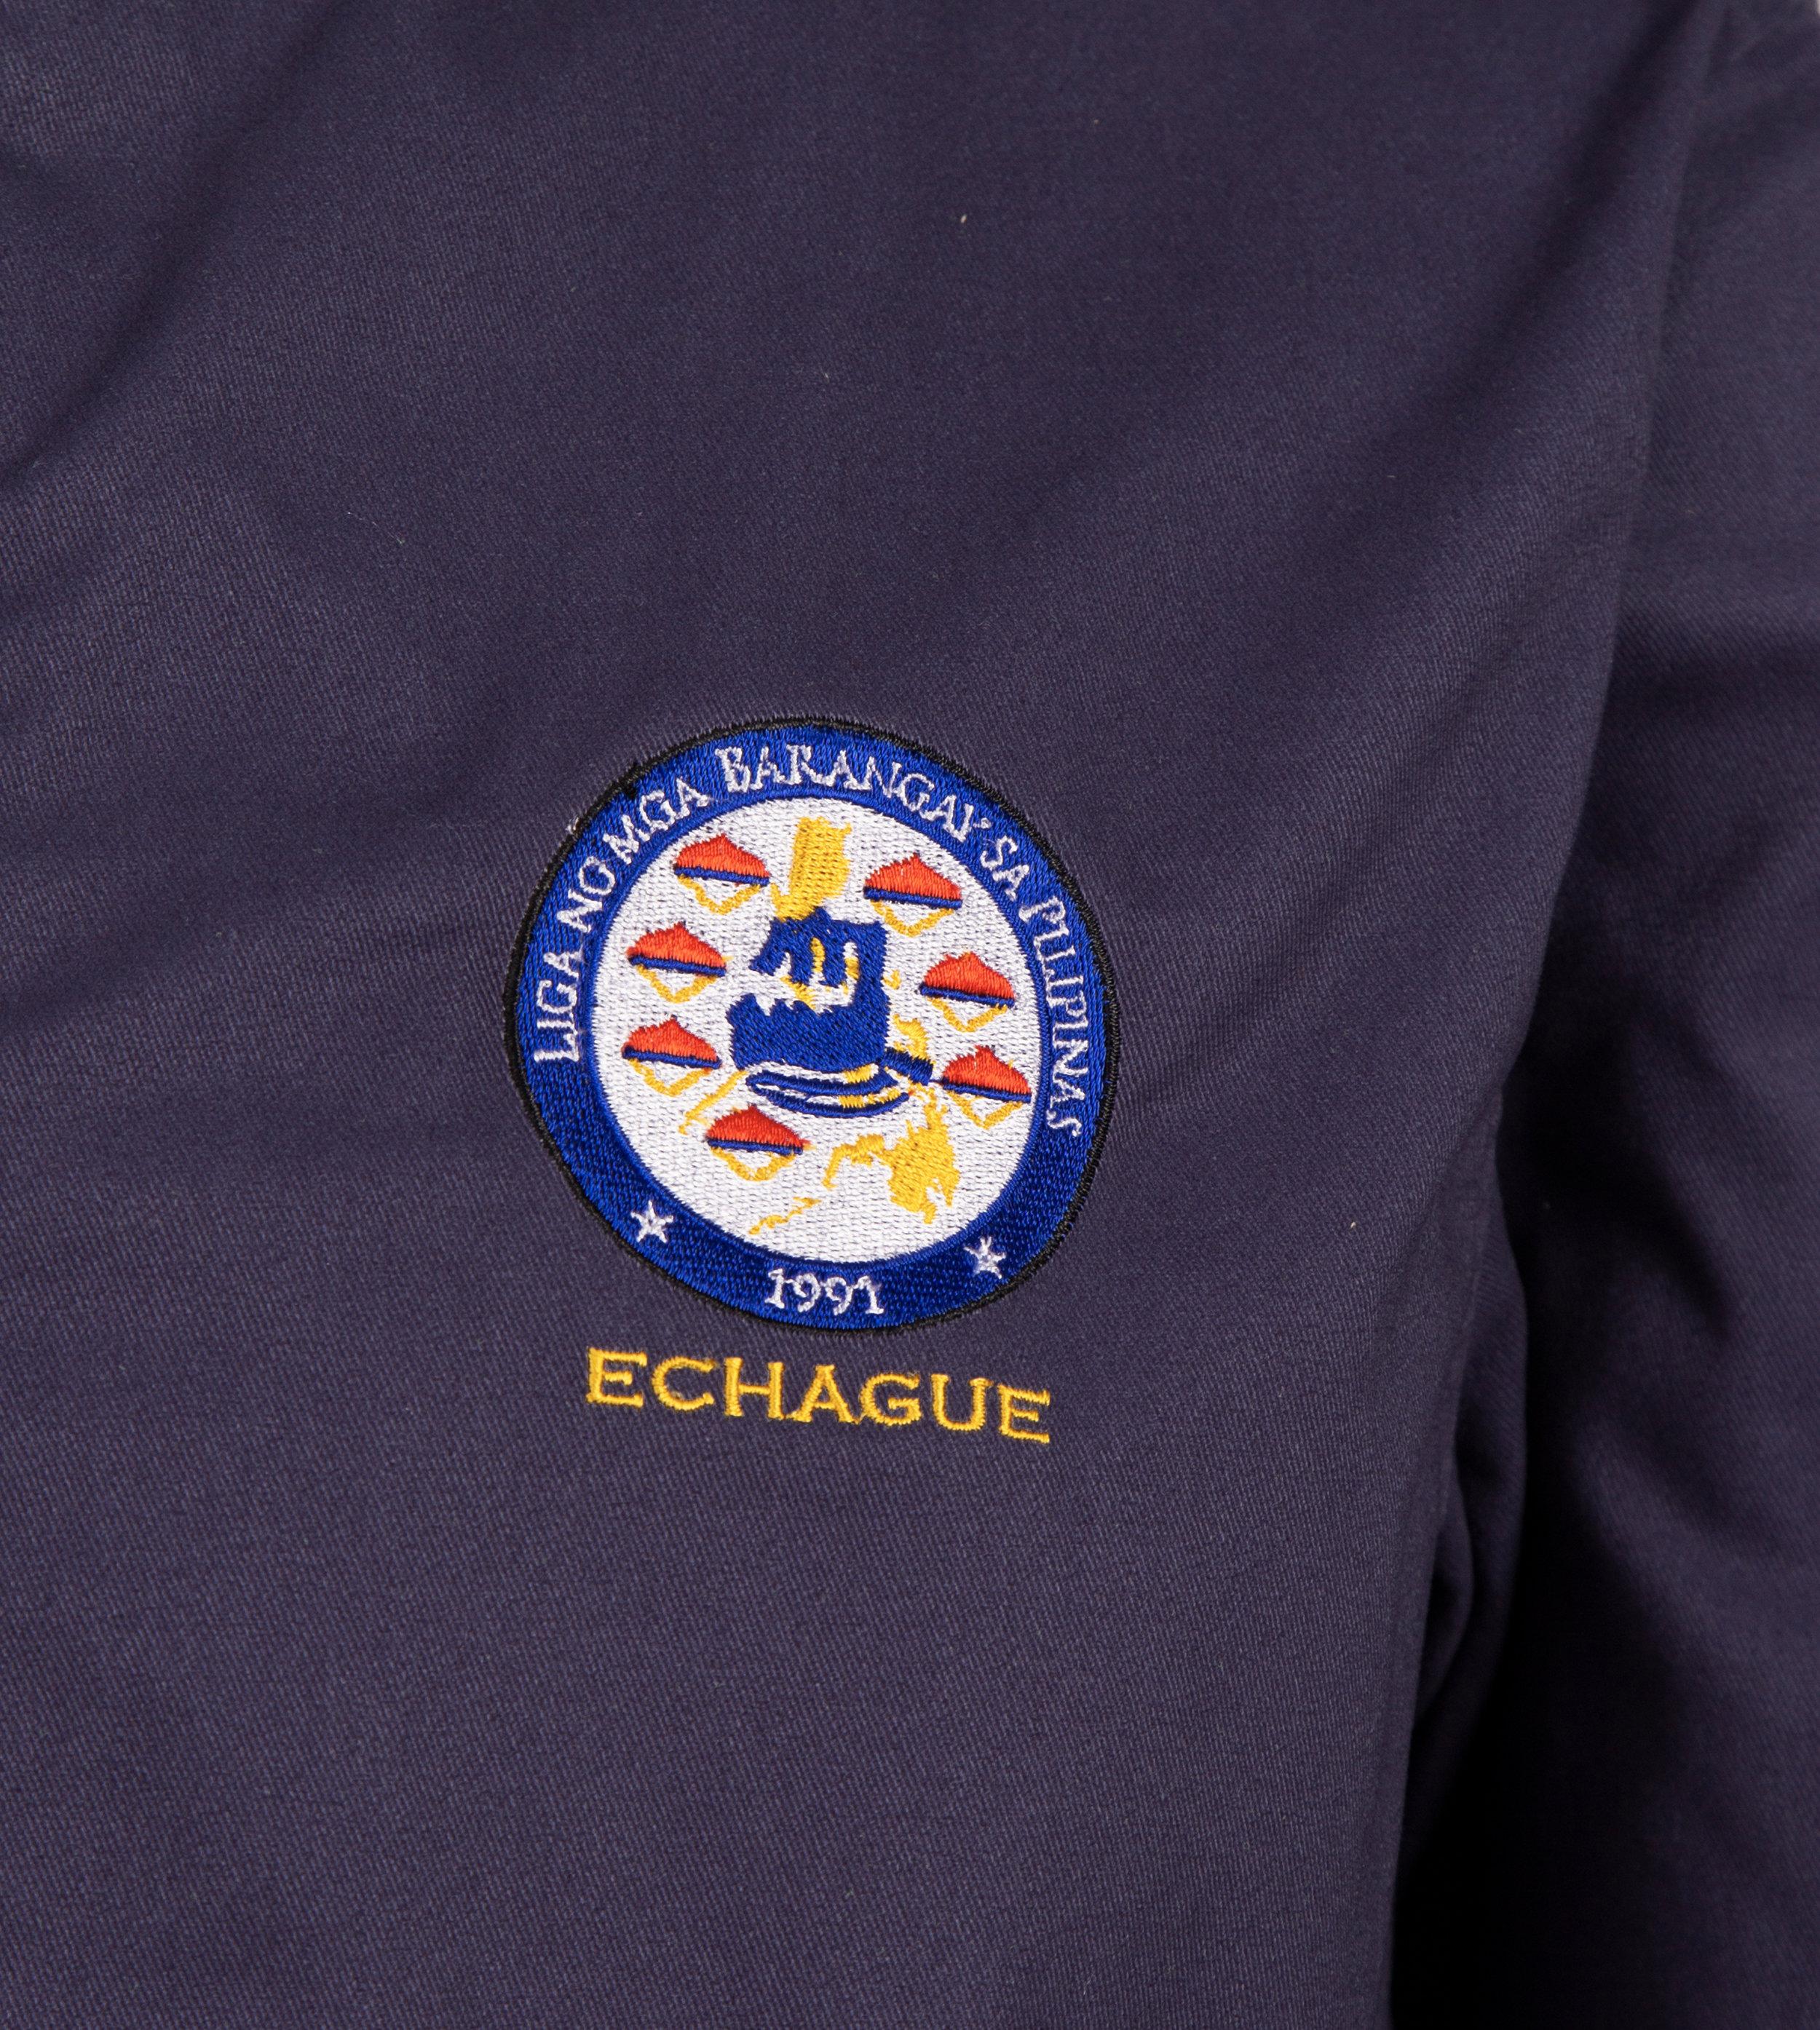 Tailored Projects-Custom Jacket-Bomber Jacket-Echague-Embroidery.jpg